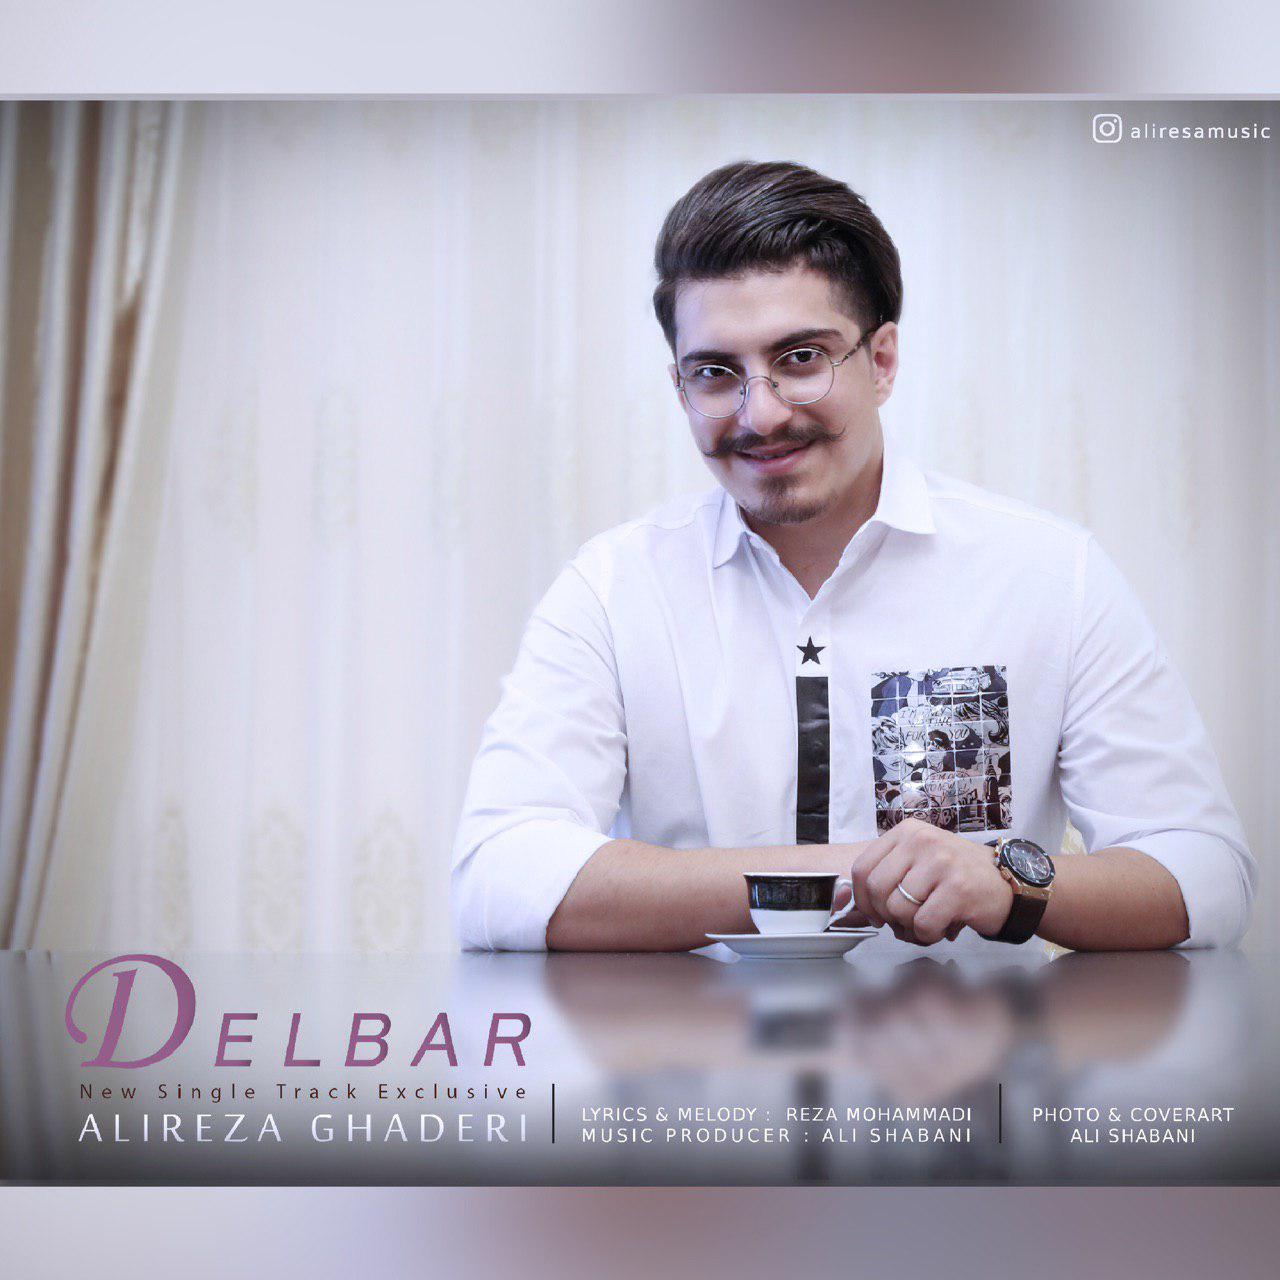 alireza ghaderi delbar دانلود اهنگ دلبر علیرضا قادری